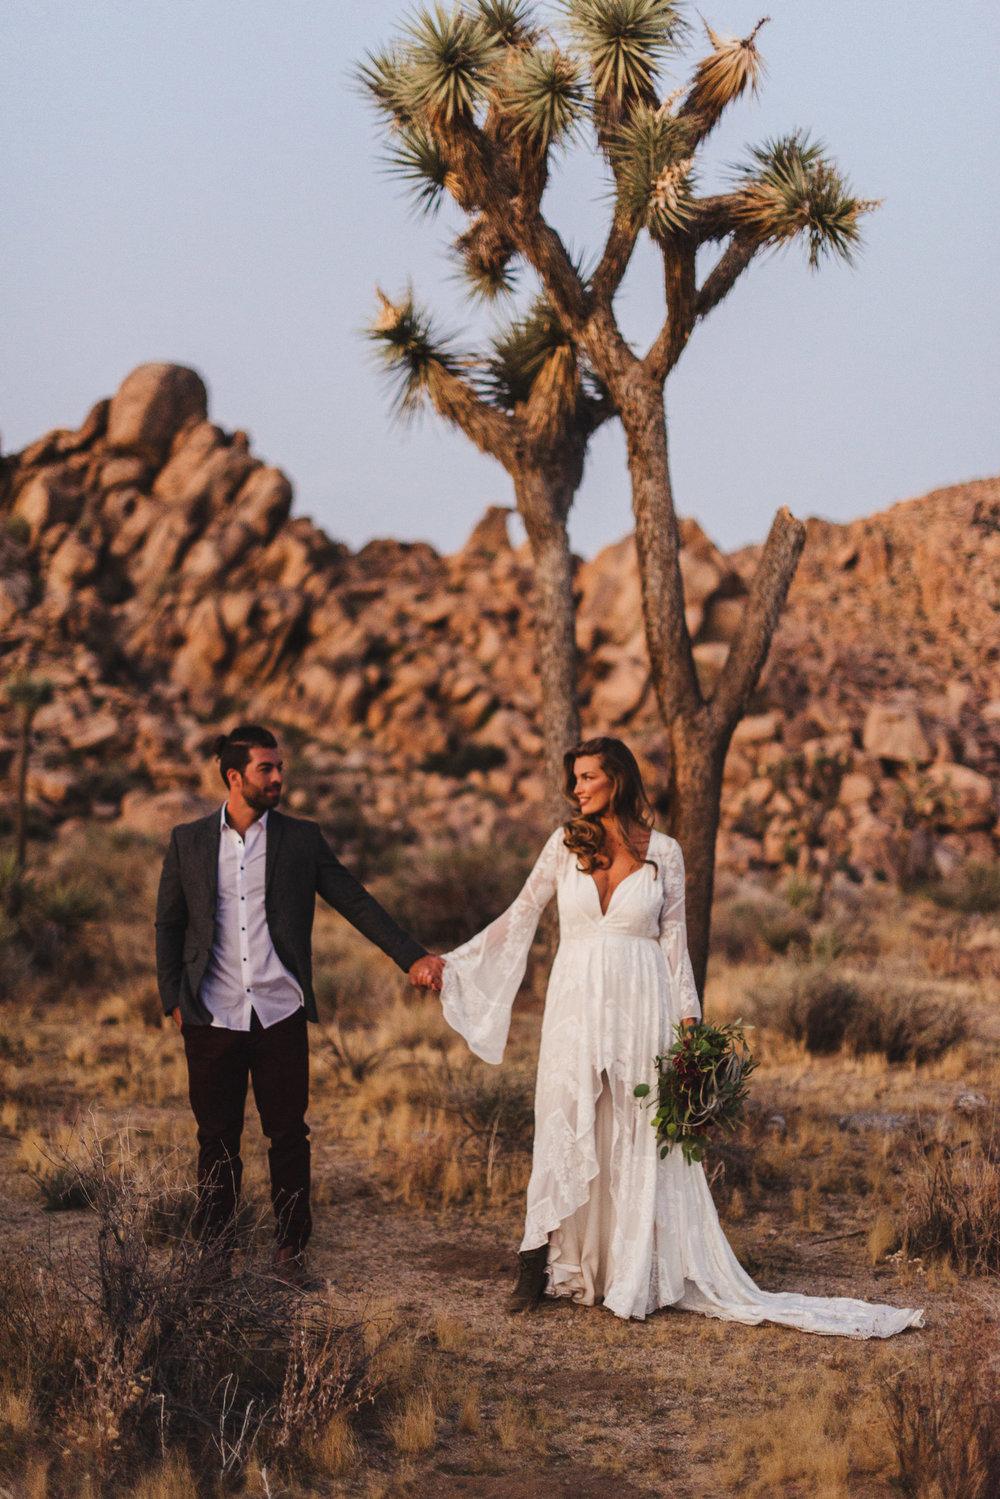 sMagdalena + Yoan - Elopement, Joshua Tree CA-172.jpg